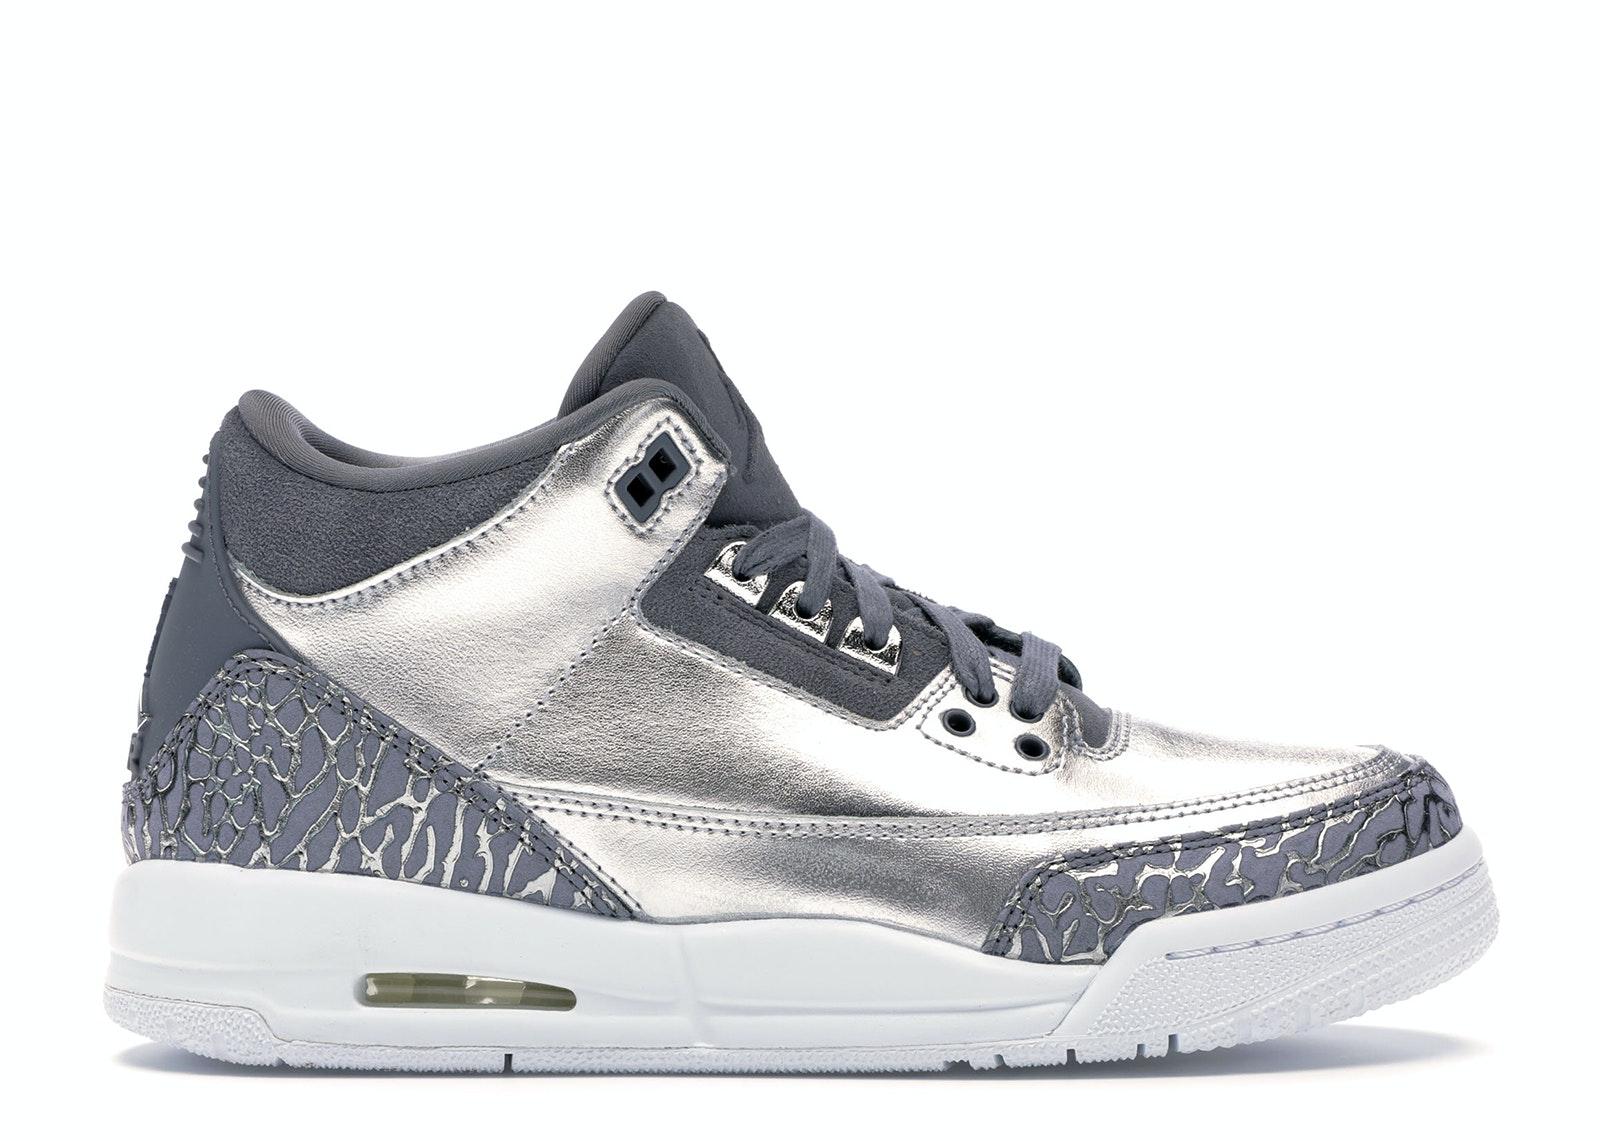 Jordan 3 Retro Premium Heiress Metallic Silver (GS)